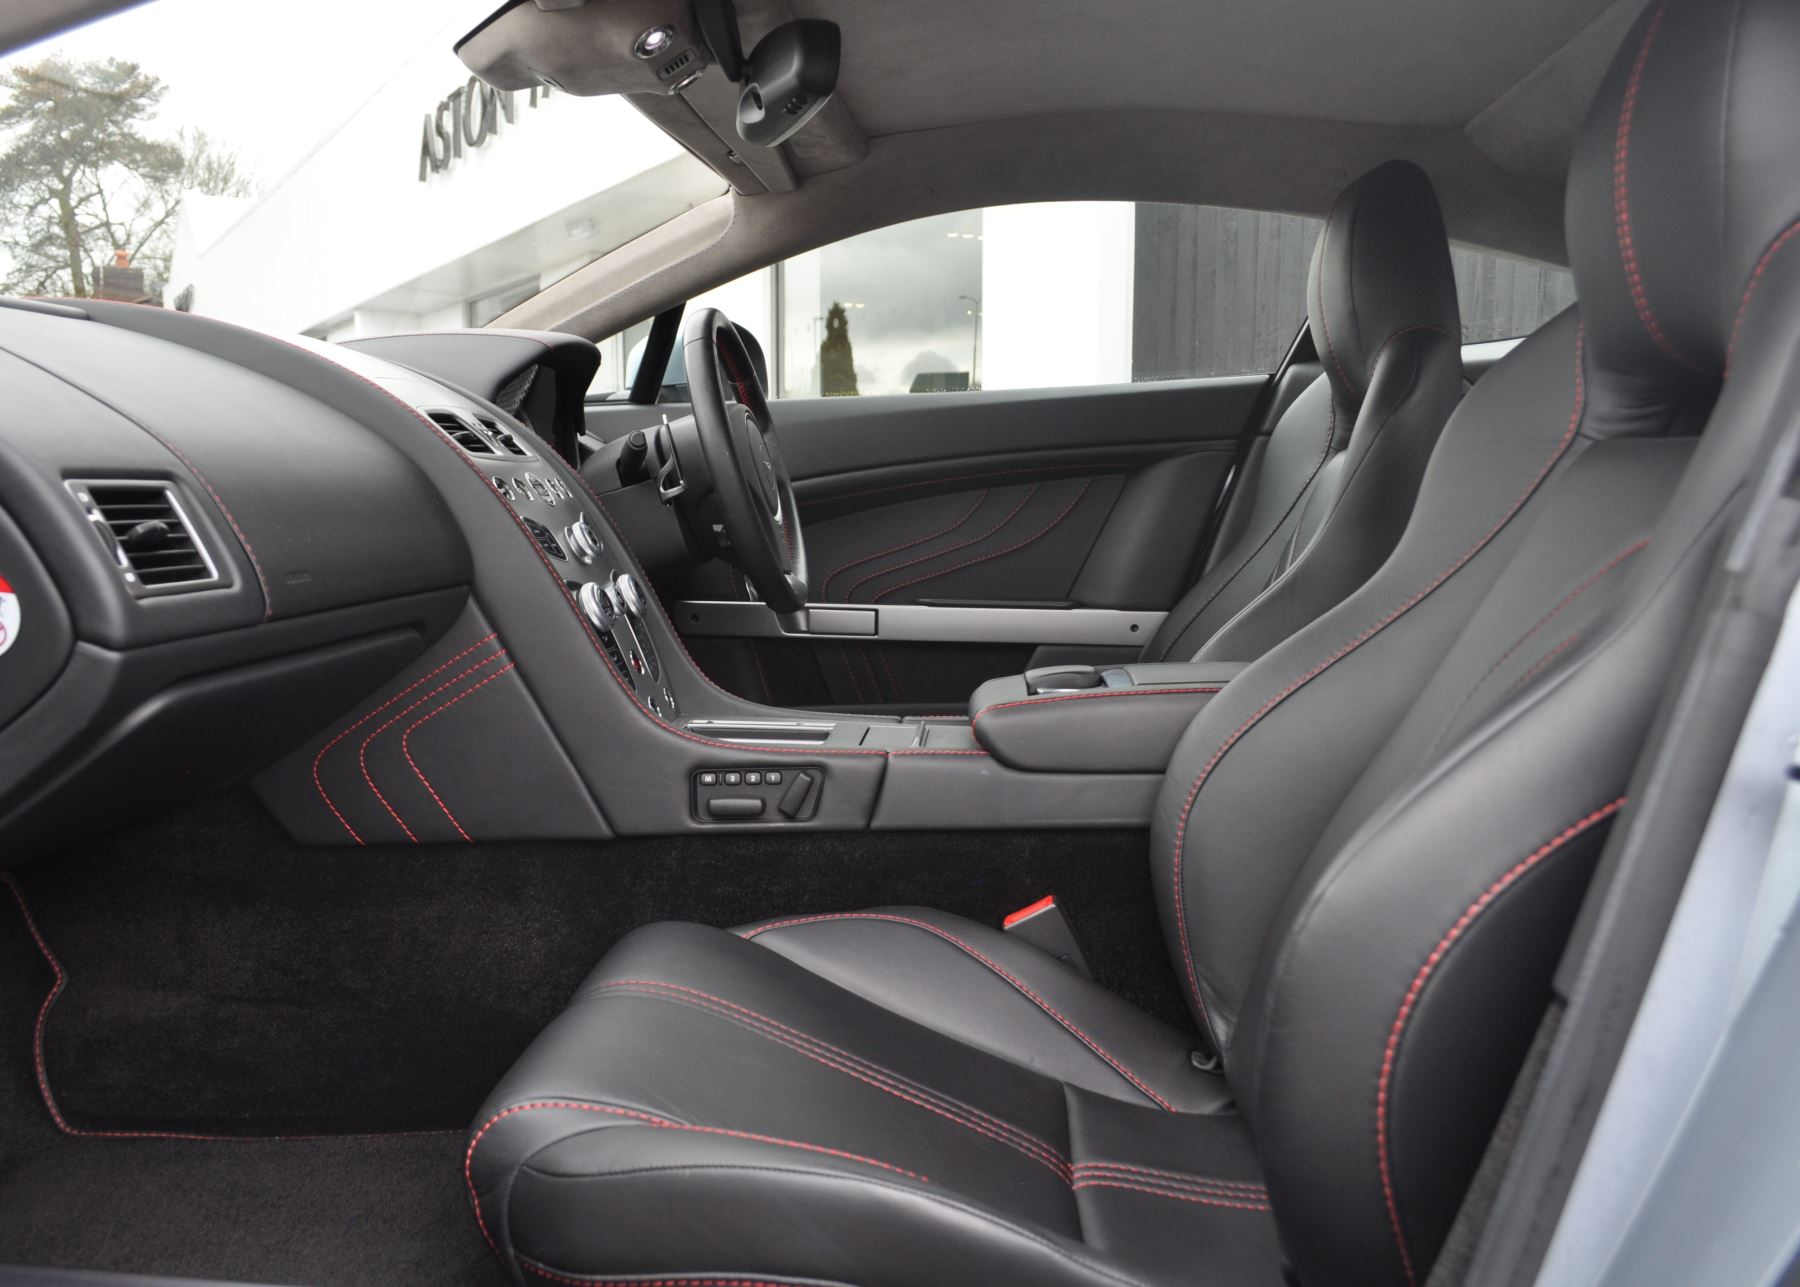 Aston Martin V8 Vantage S Coupe Coupe image 25